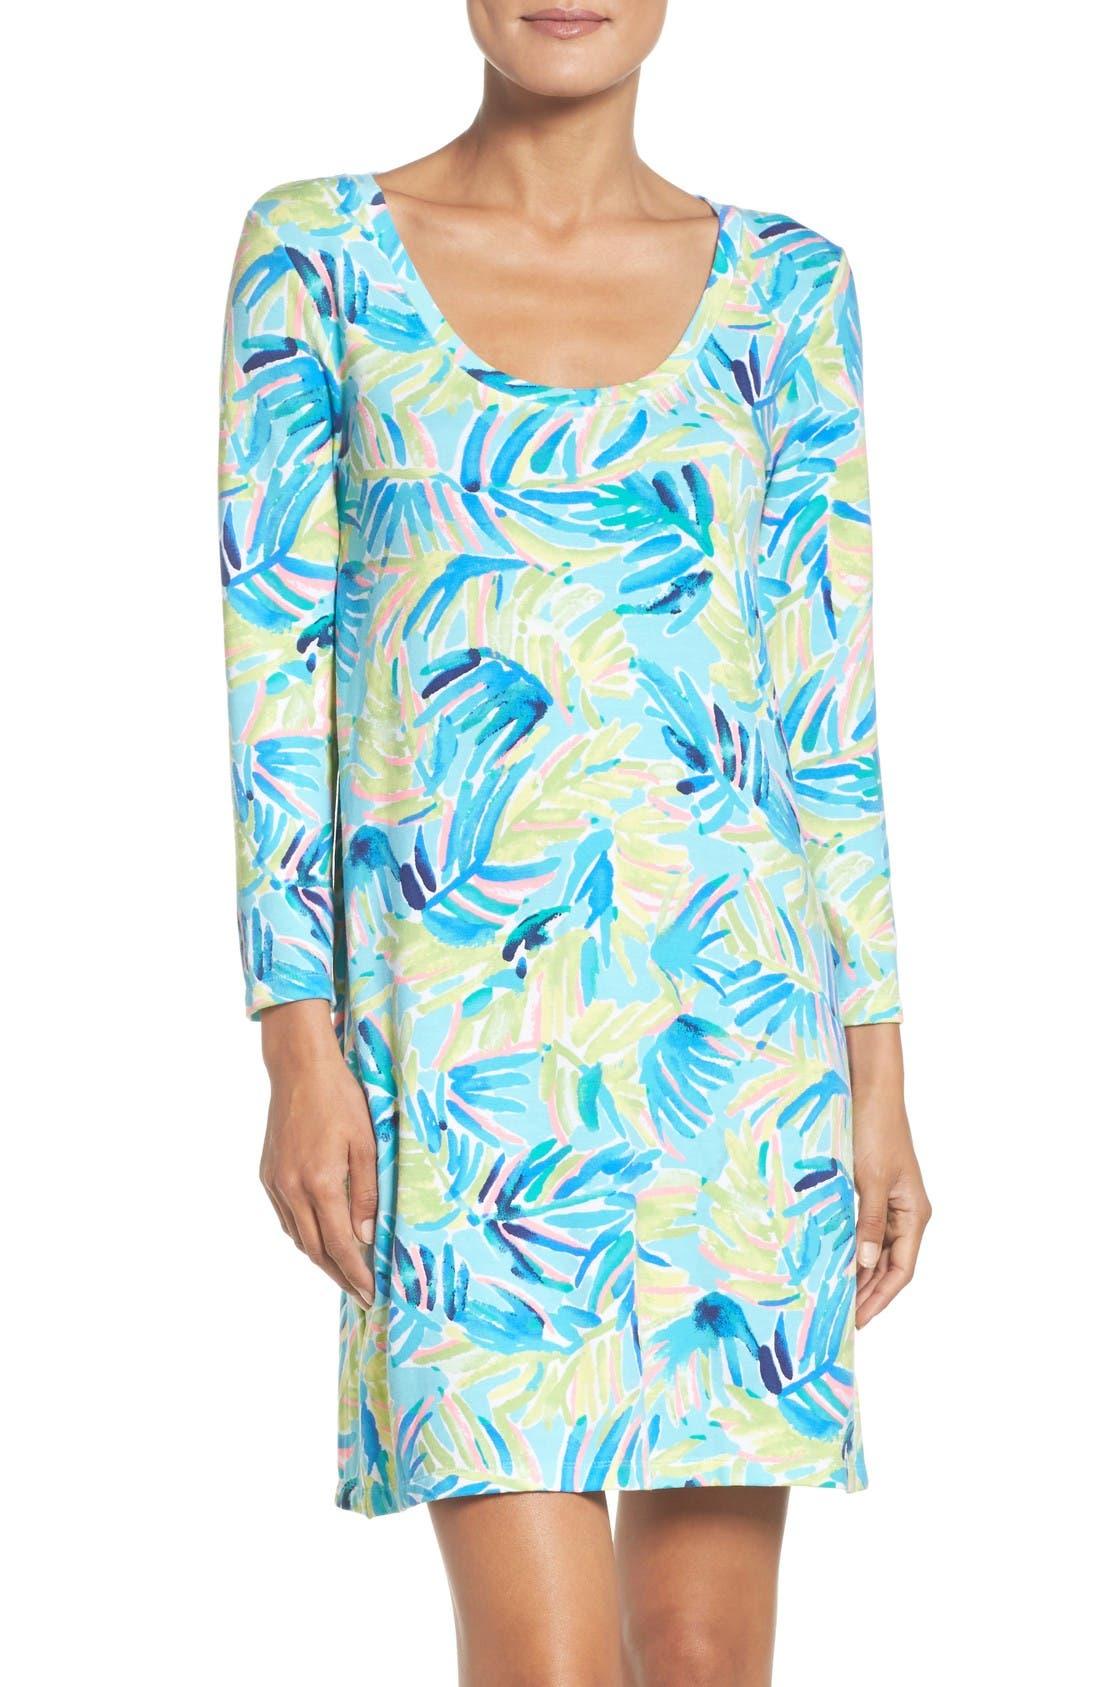 Alternate Image 1 Selected - Lilly Pulitzer® Devon Dress